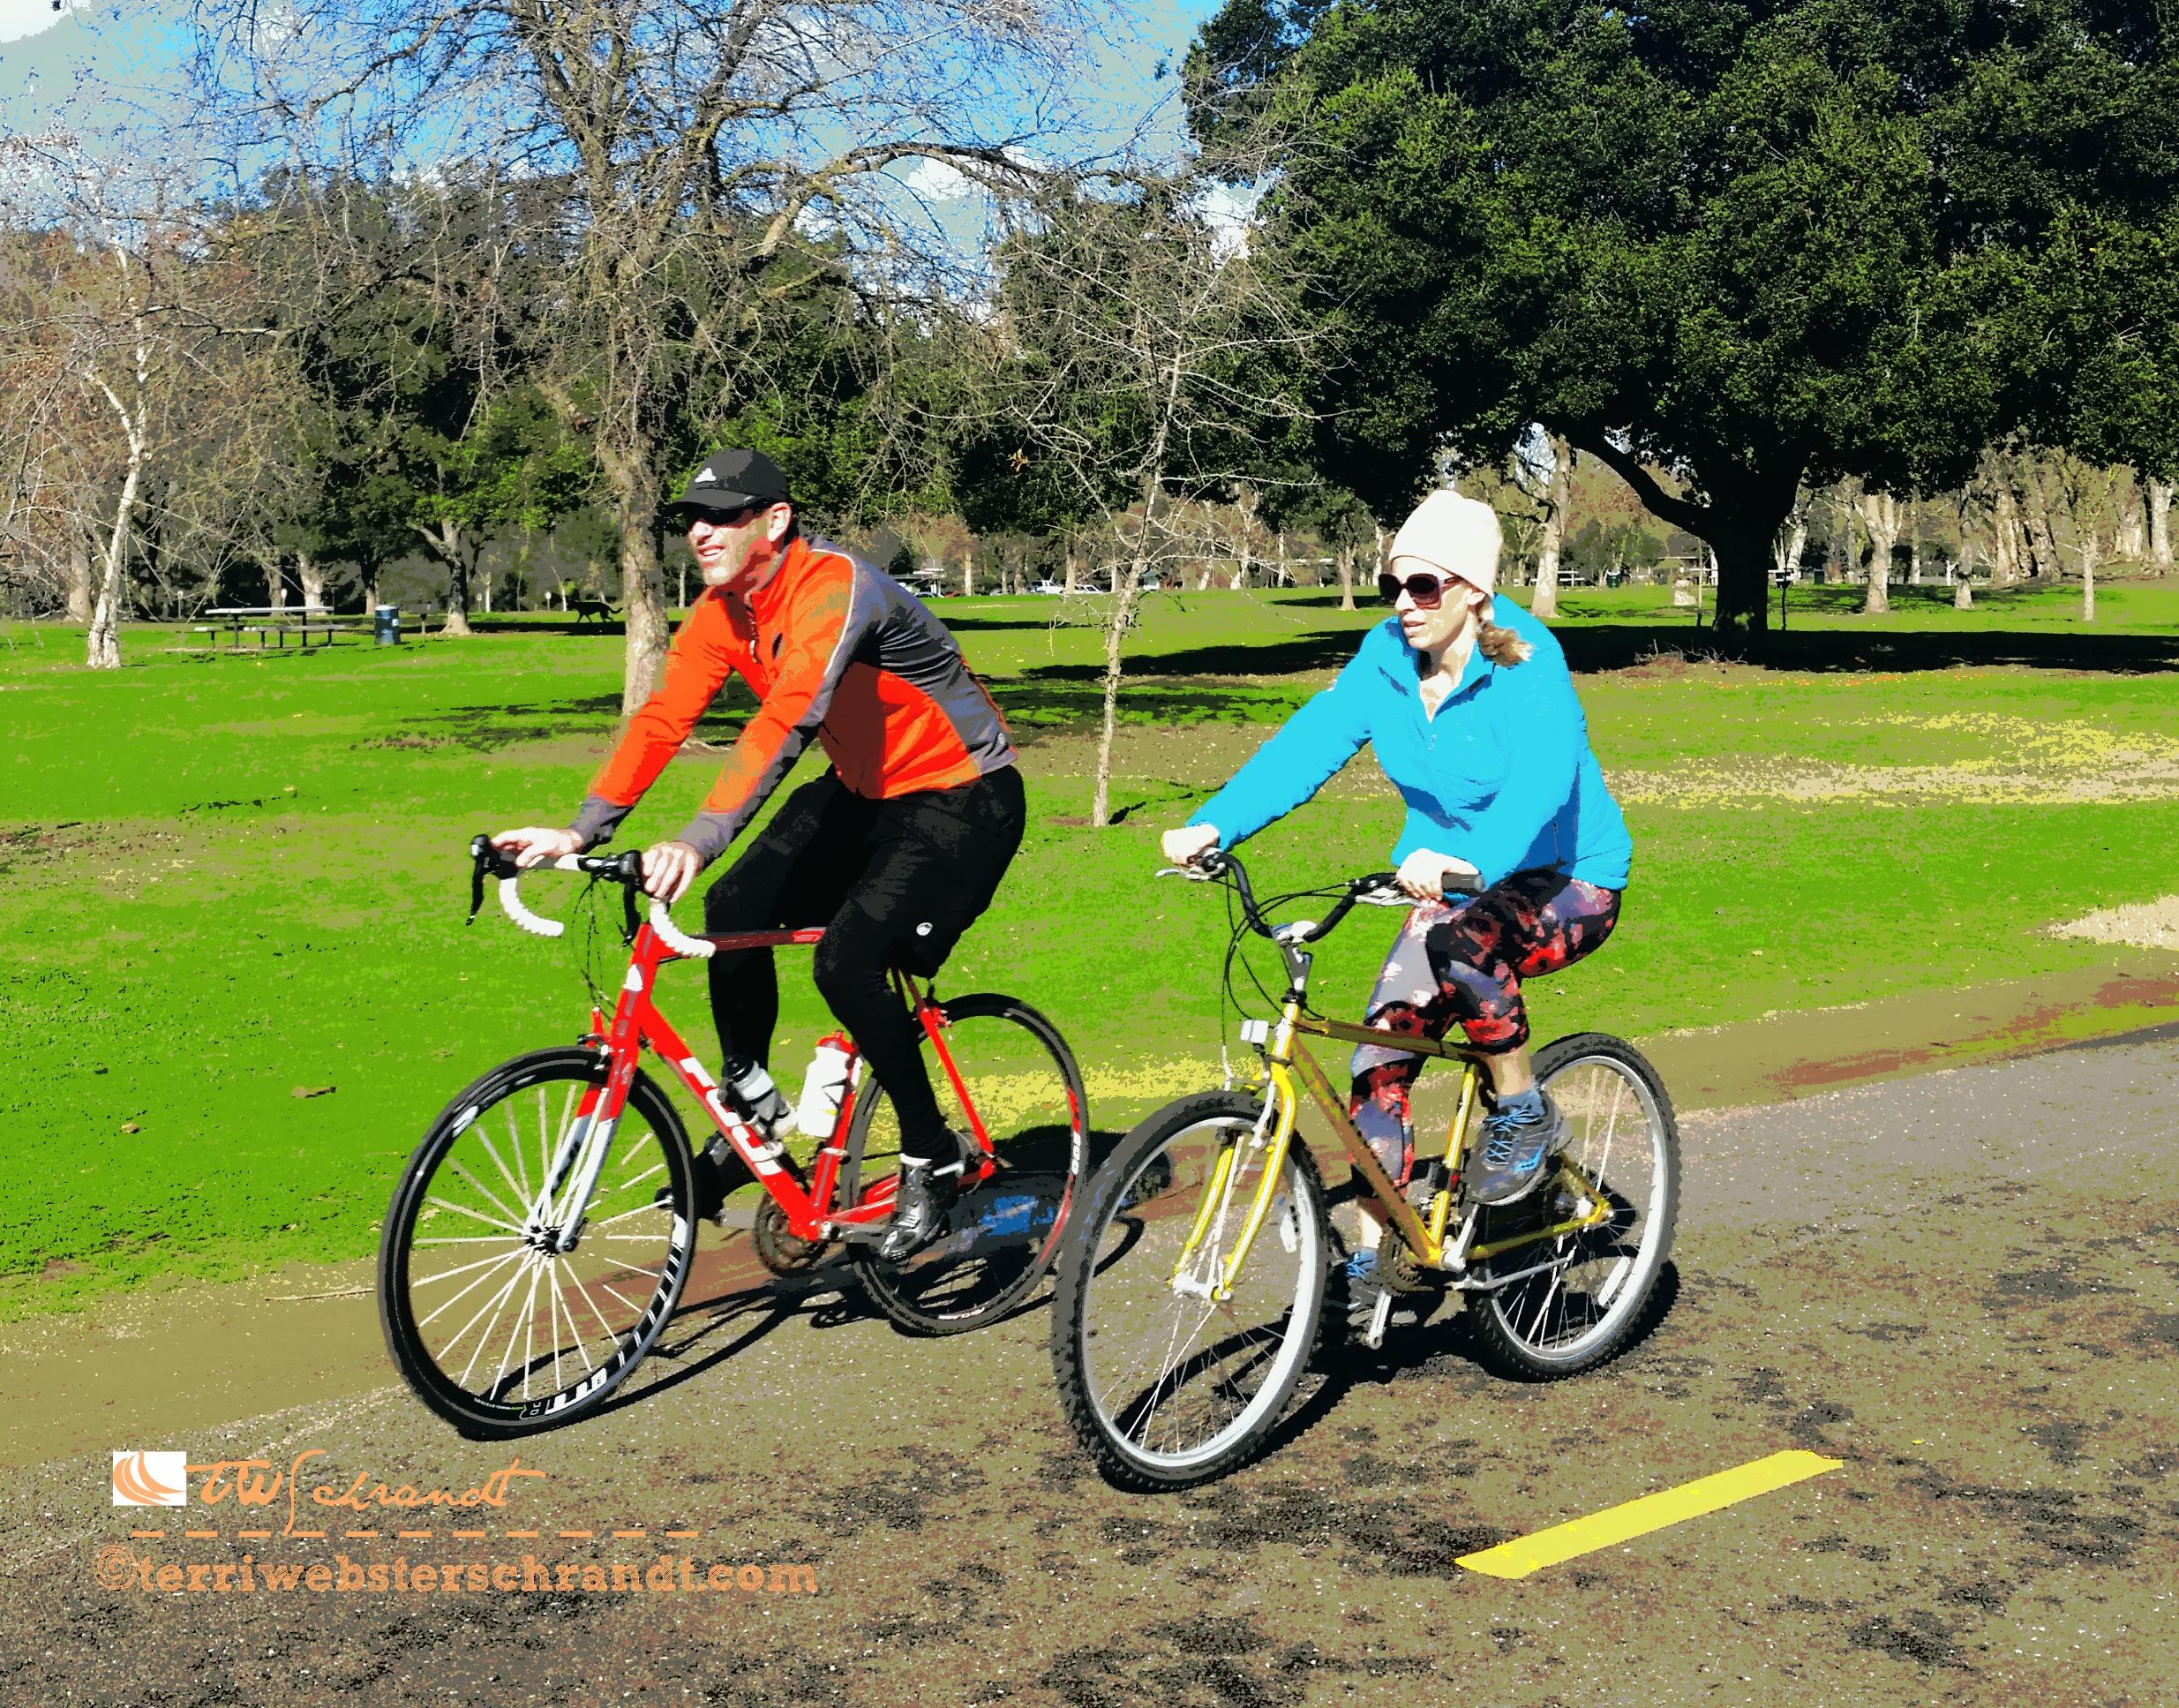 Cycling buddy, cold day bike ride